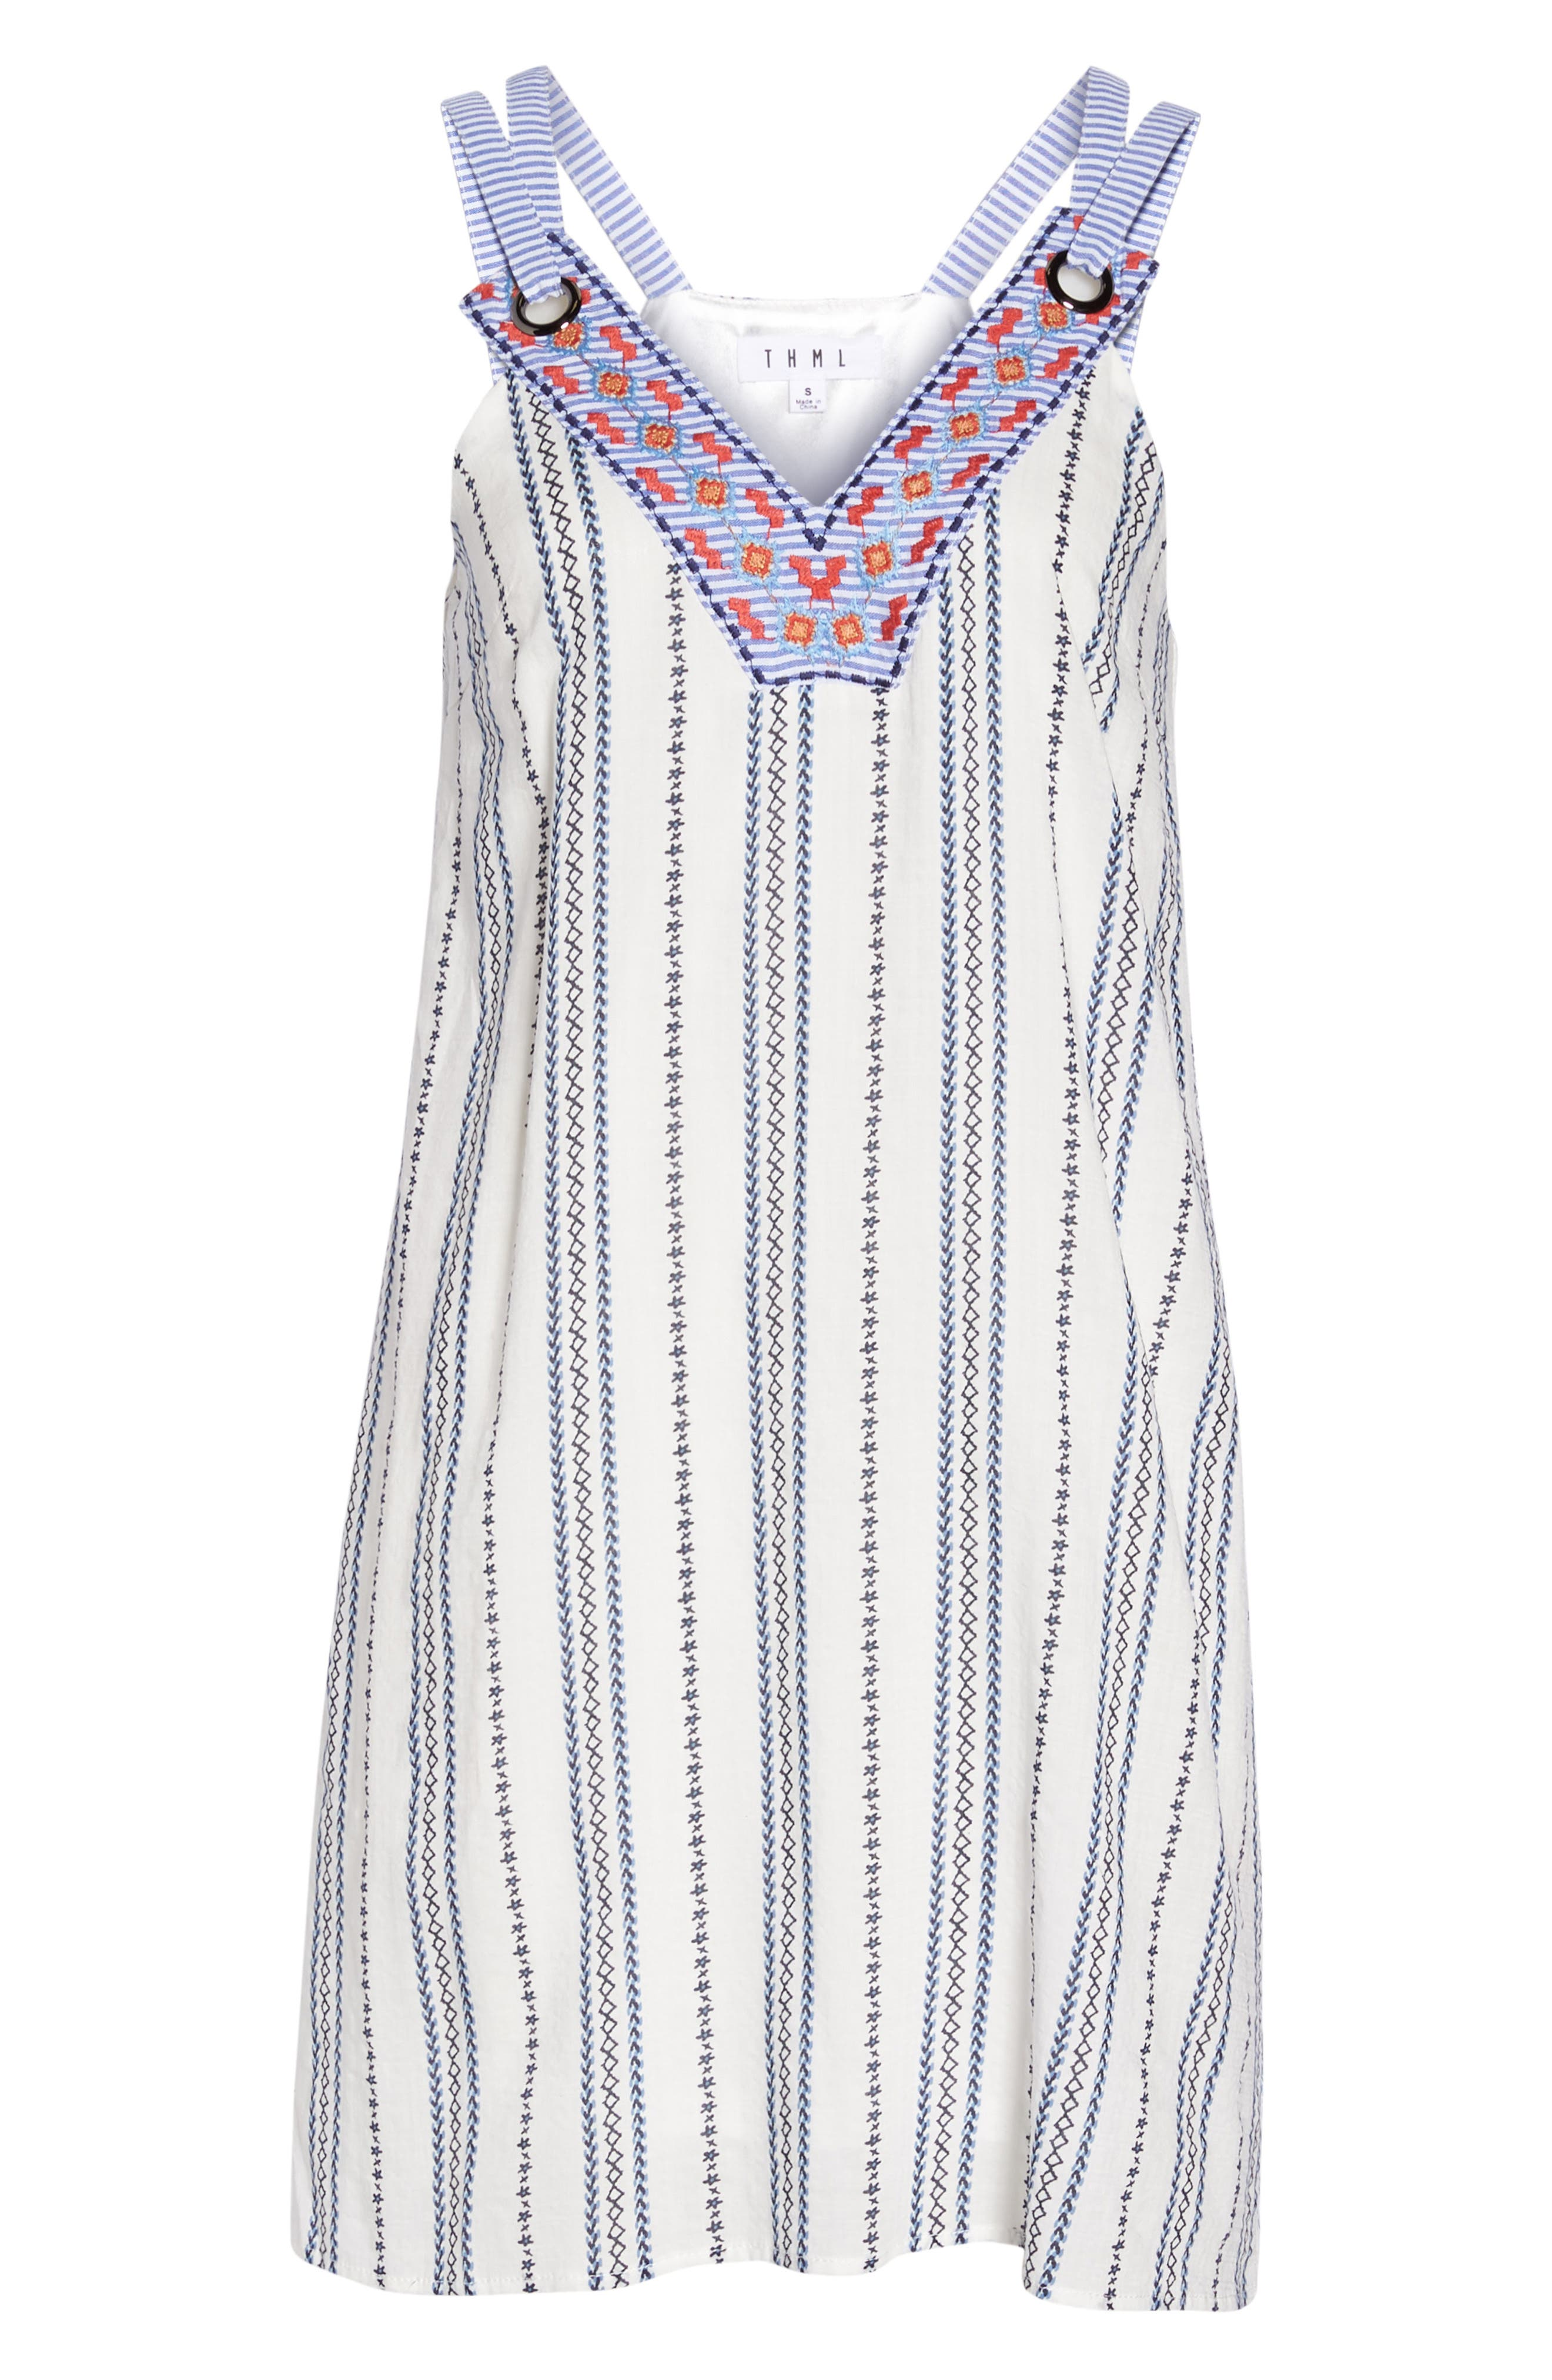 Stripe & Embroidery Shift Dress,                             Alternate thumbnail 7, color,                             White